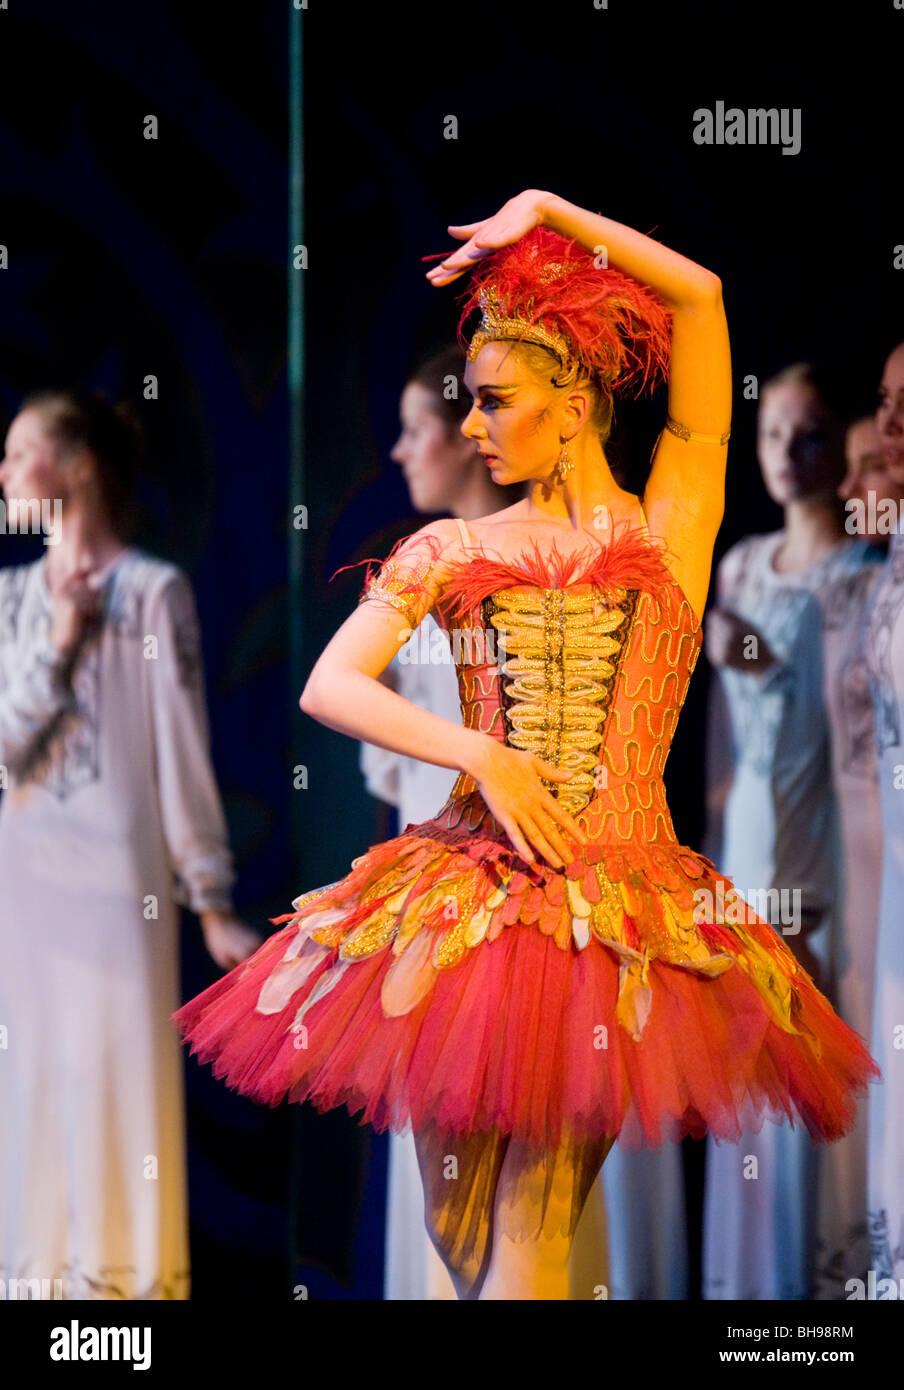 Birmingham Royal Ballet. The Firebird. - Stock Image